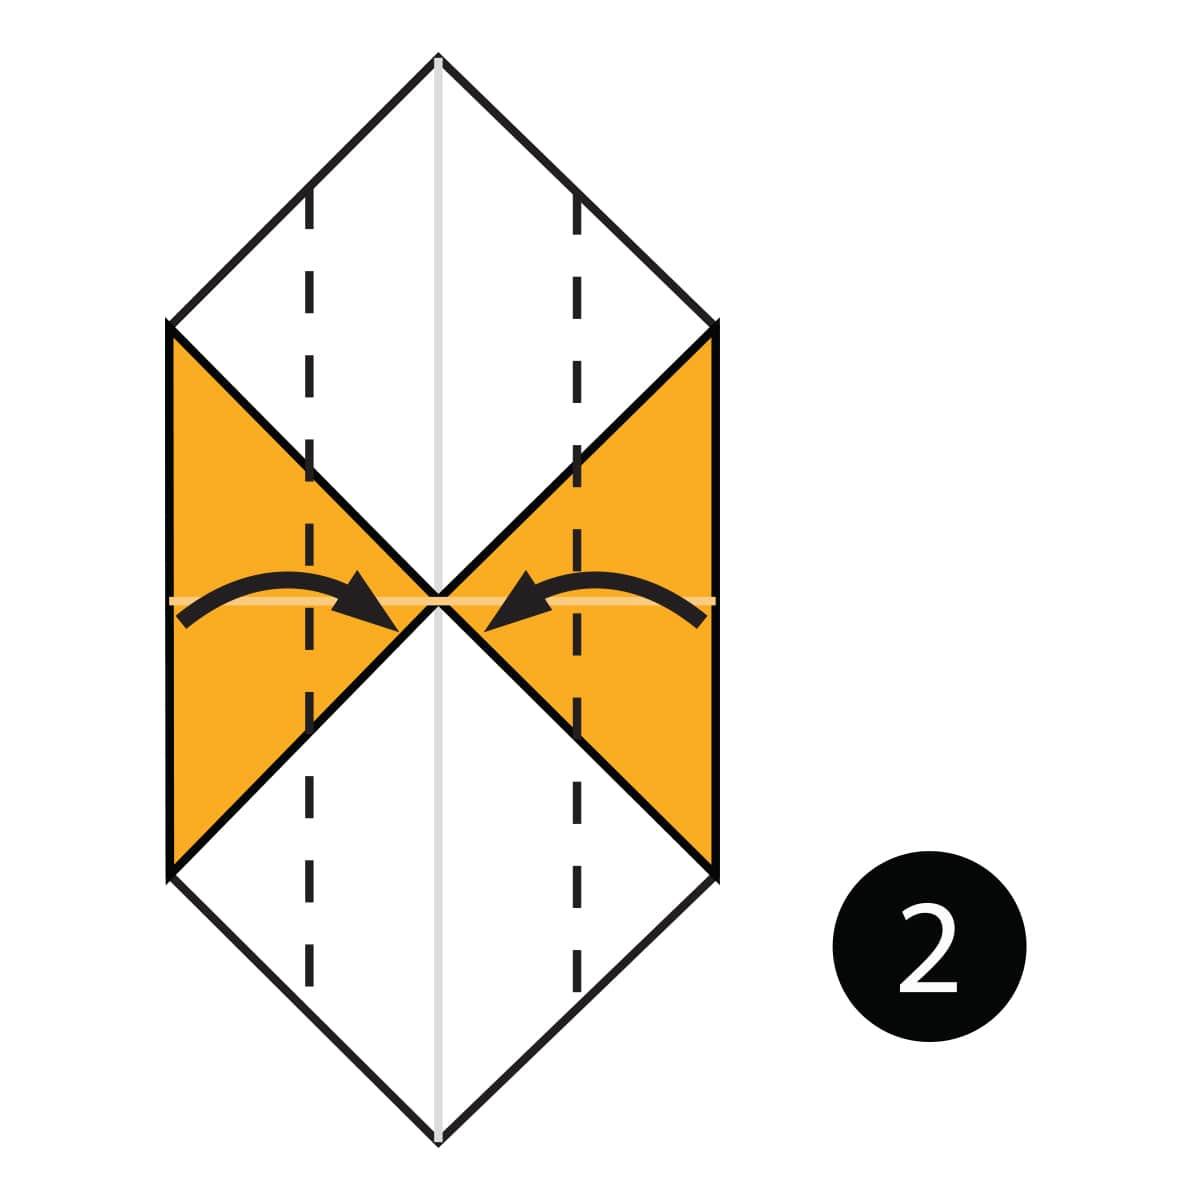 Dachshund Step 2